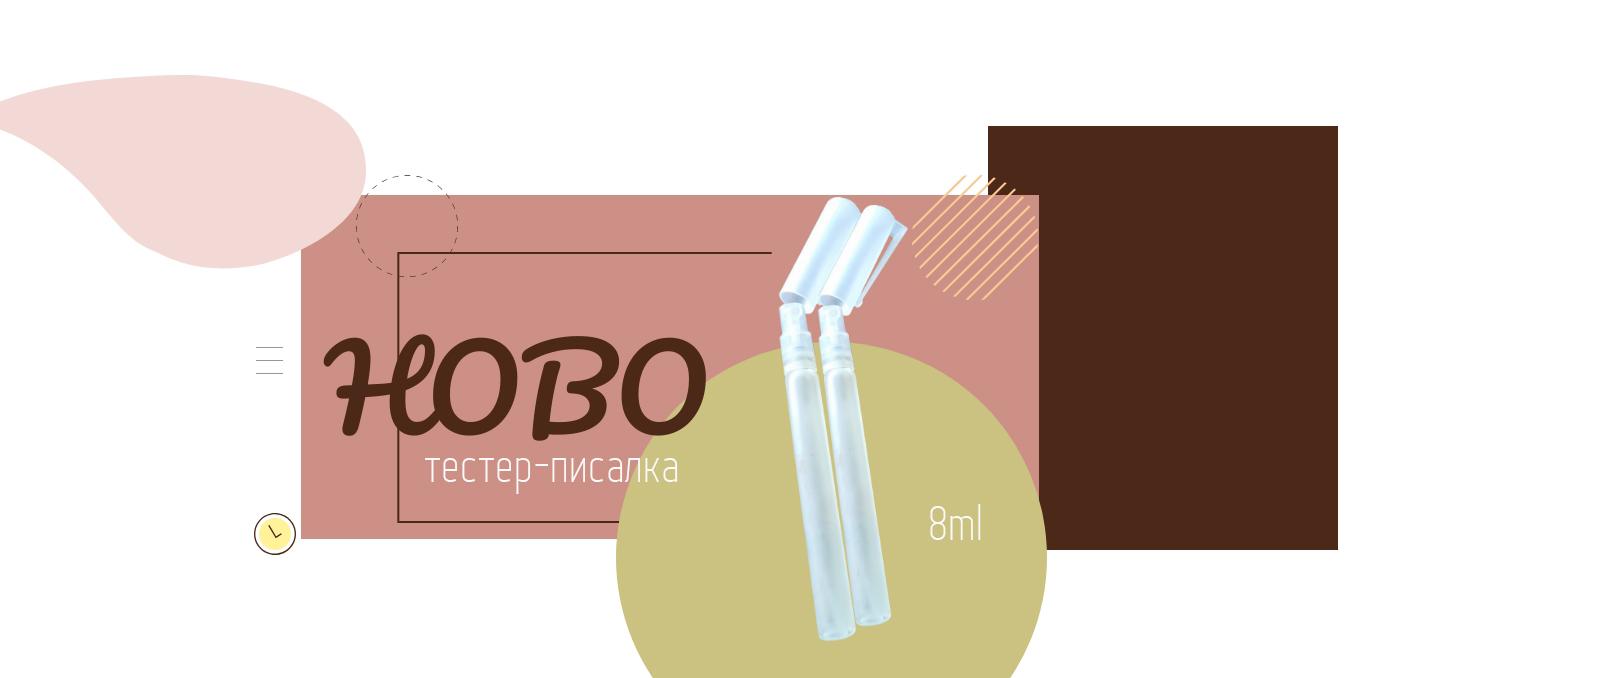 kameya parfum slider desktop testers 8ml